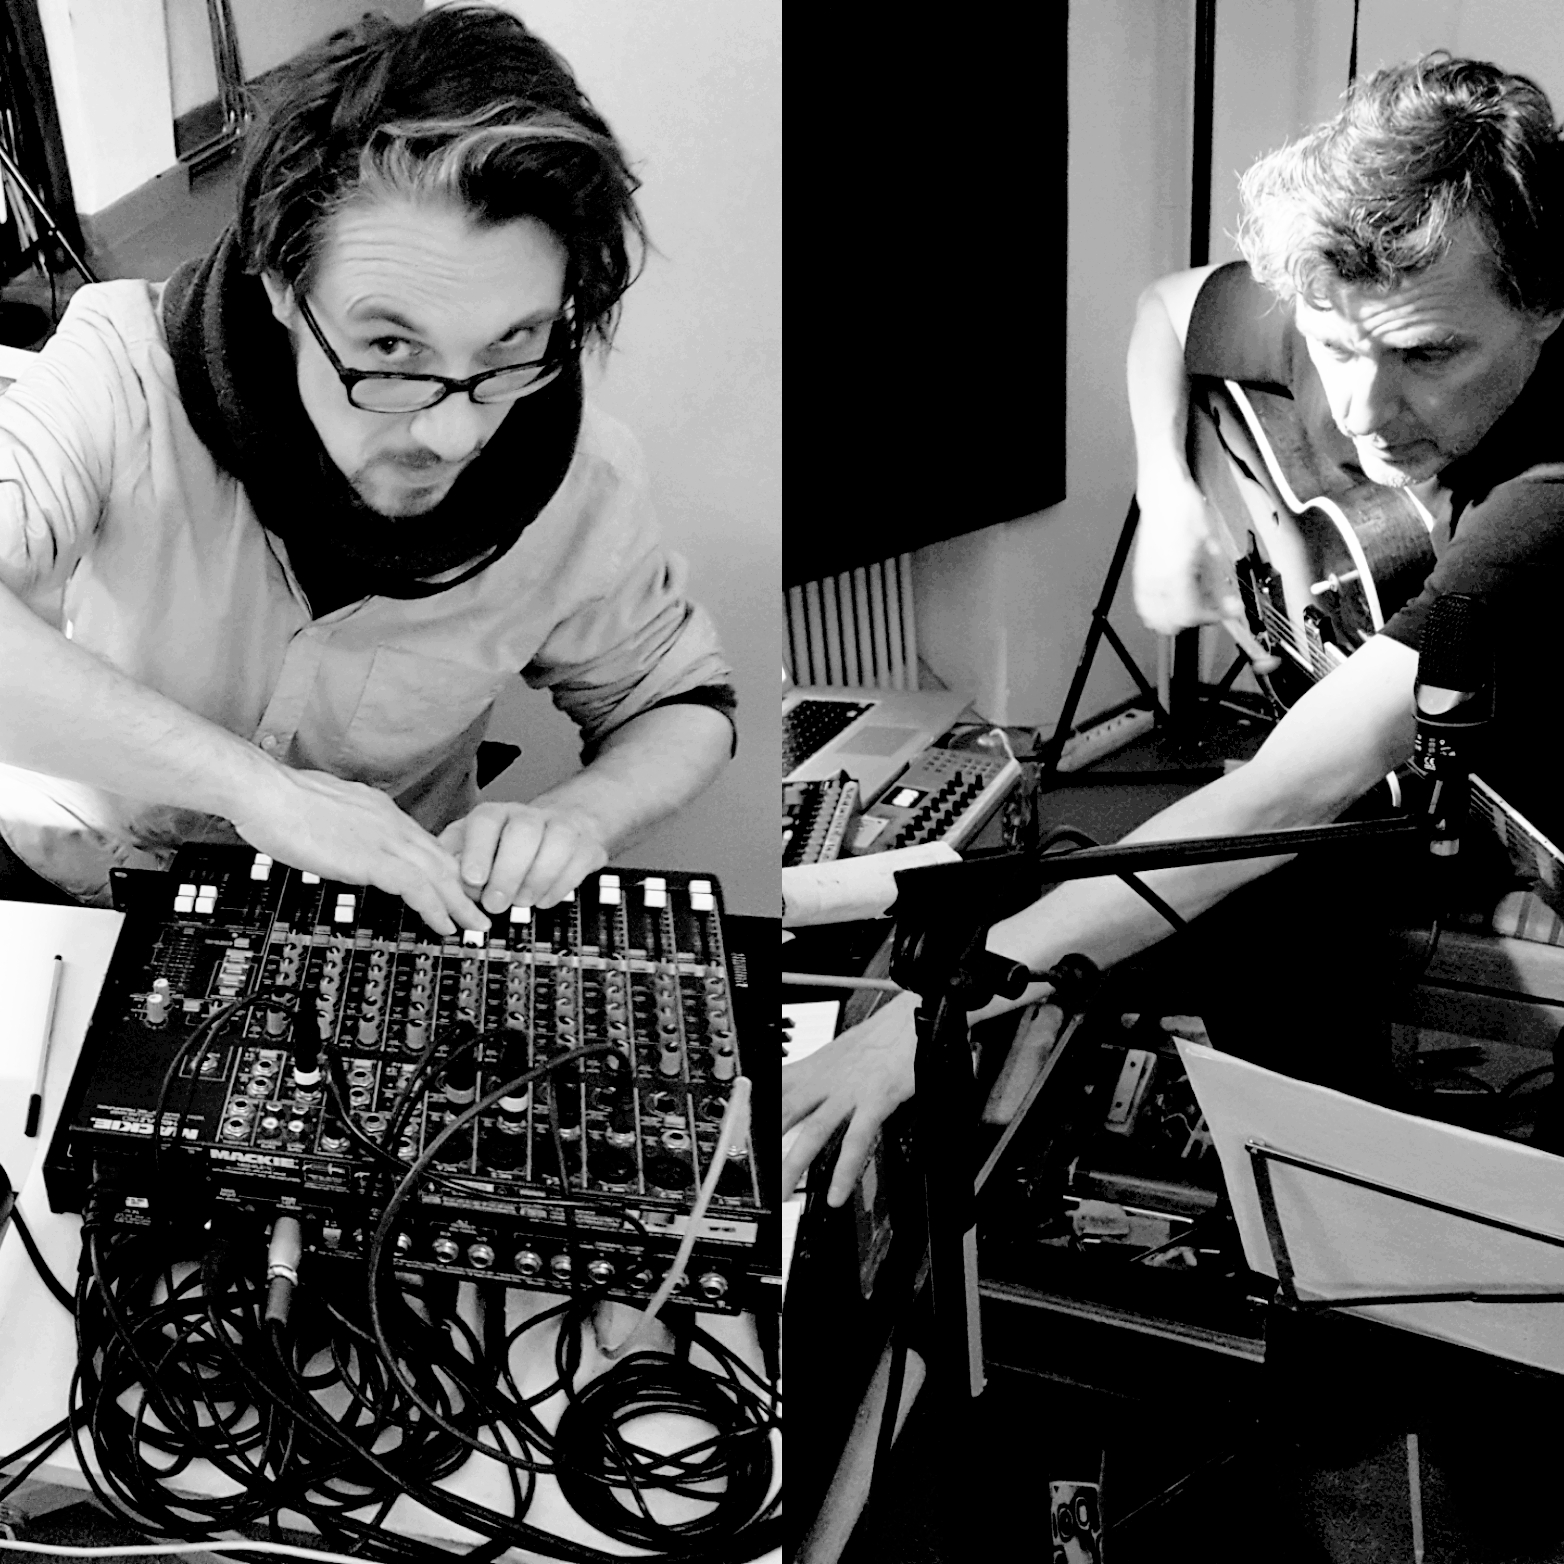 The Quiet Cue: Nicolas Wiese, Michael Renkel